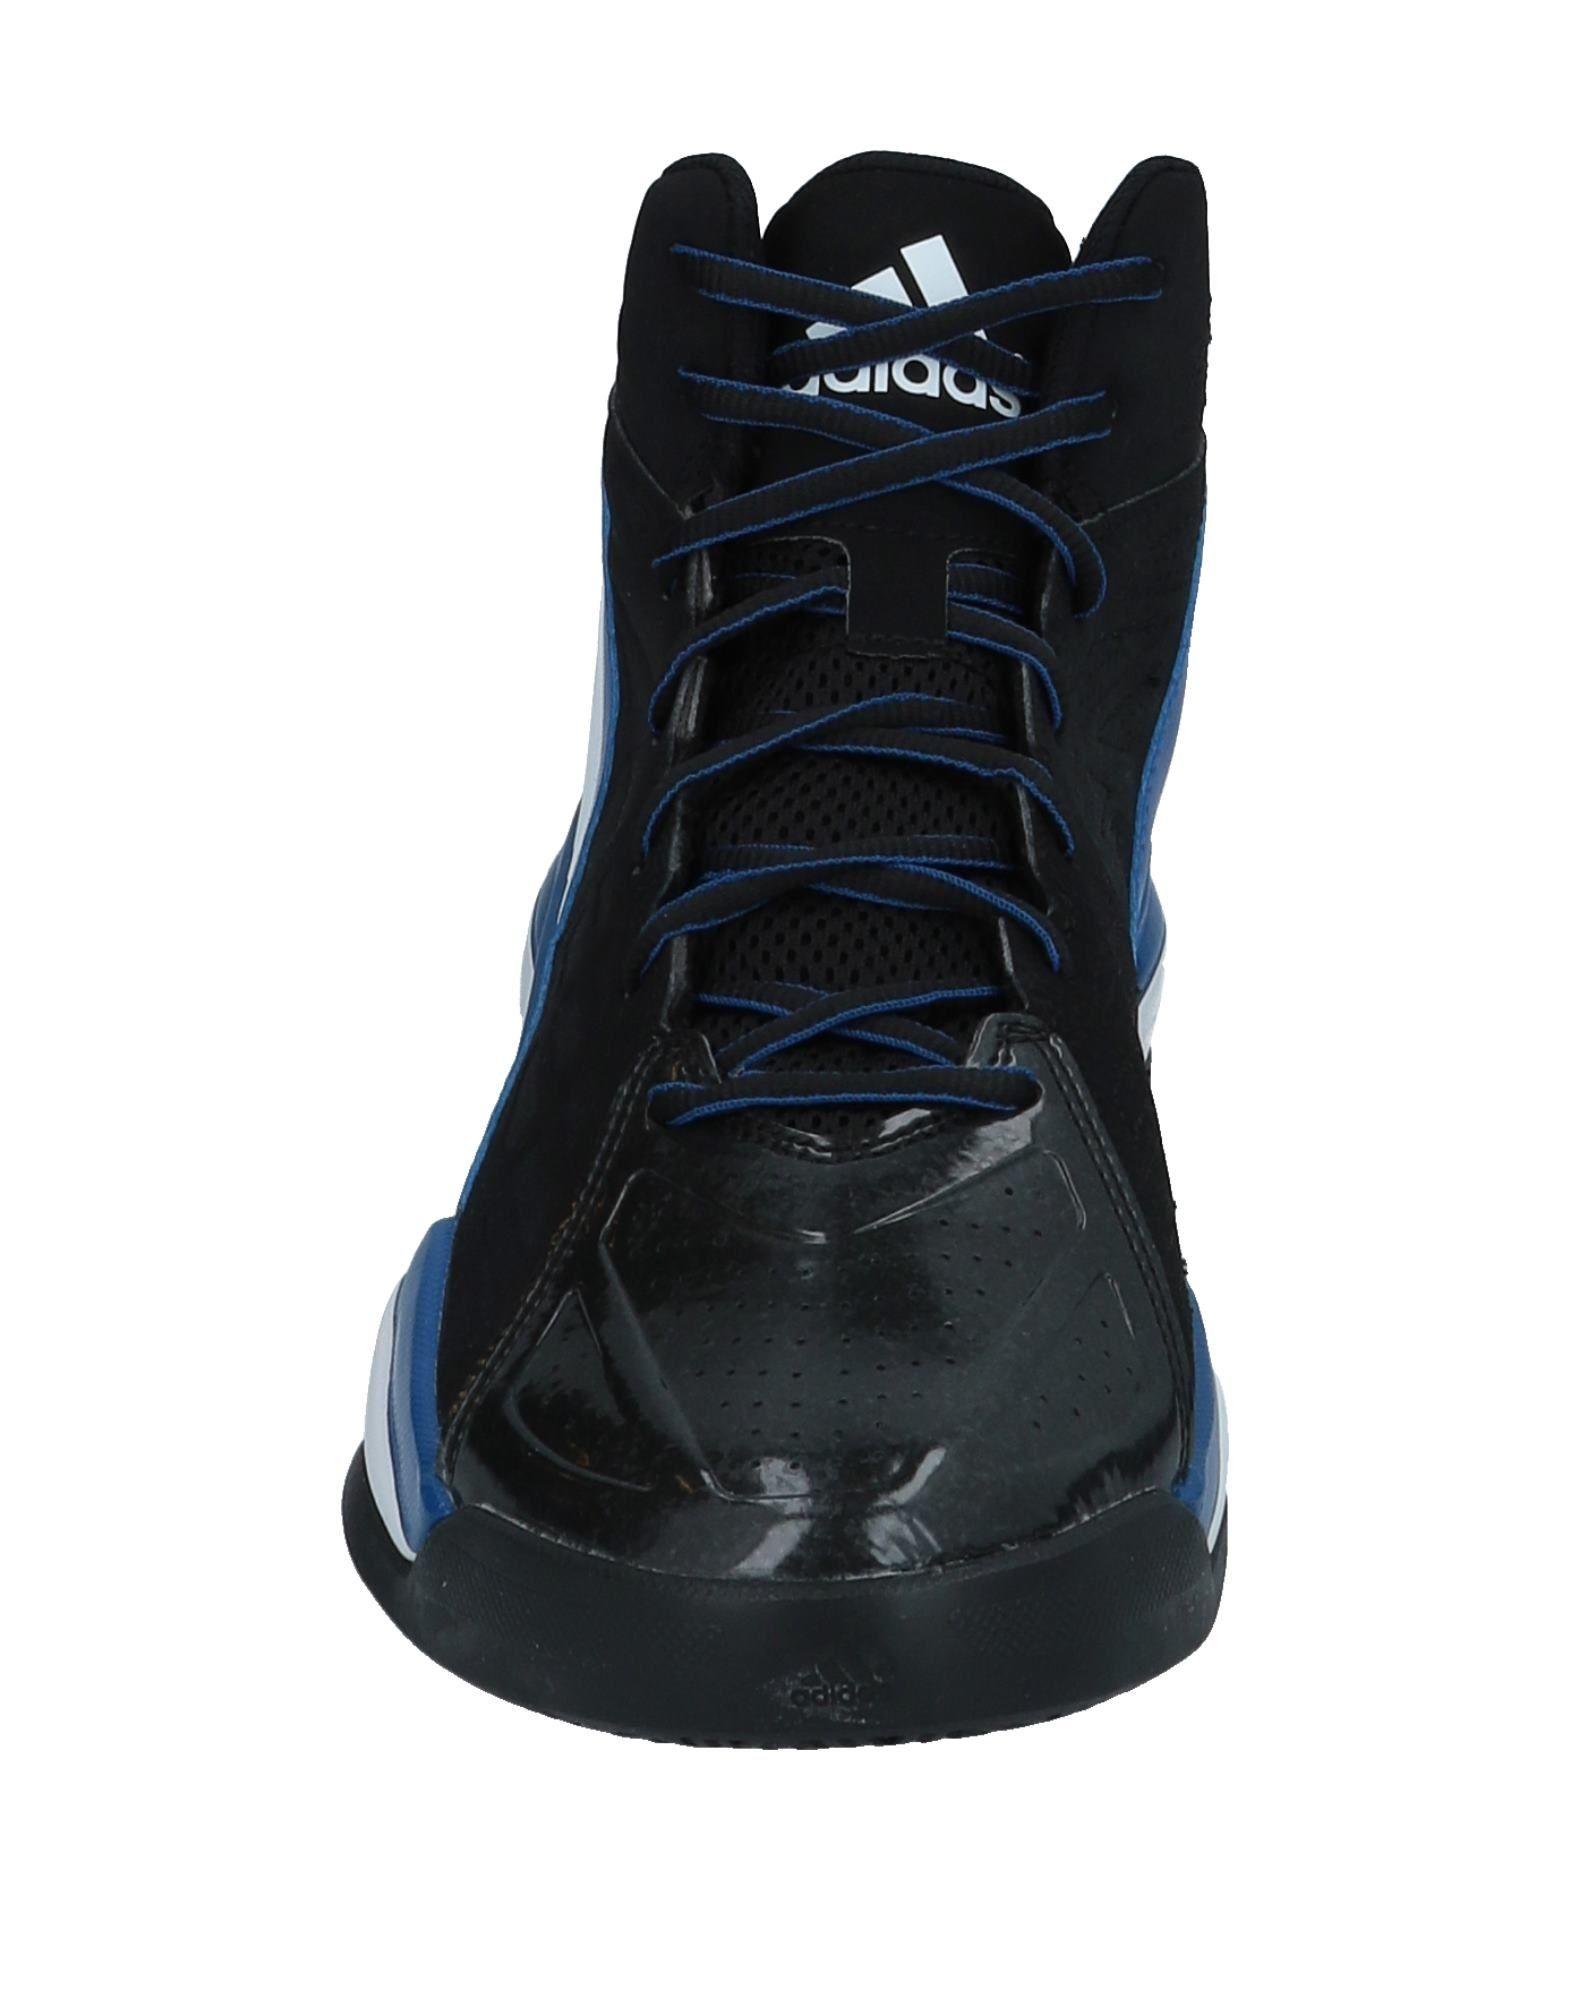 Rabatt Adidas echte Schuhe Adidas Rabatt Sneakers Herren  11519204PK 6cc033